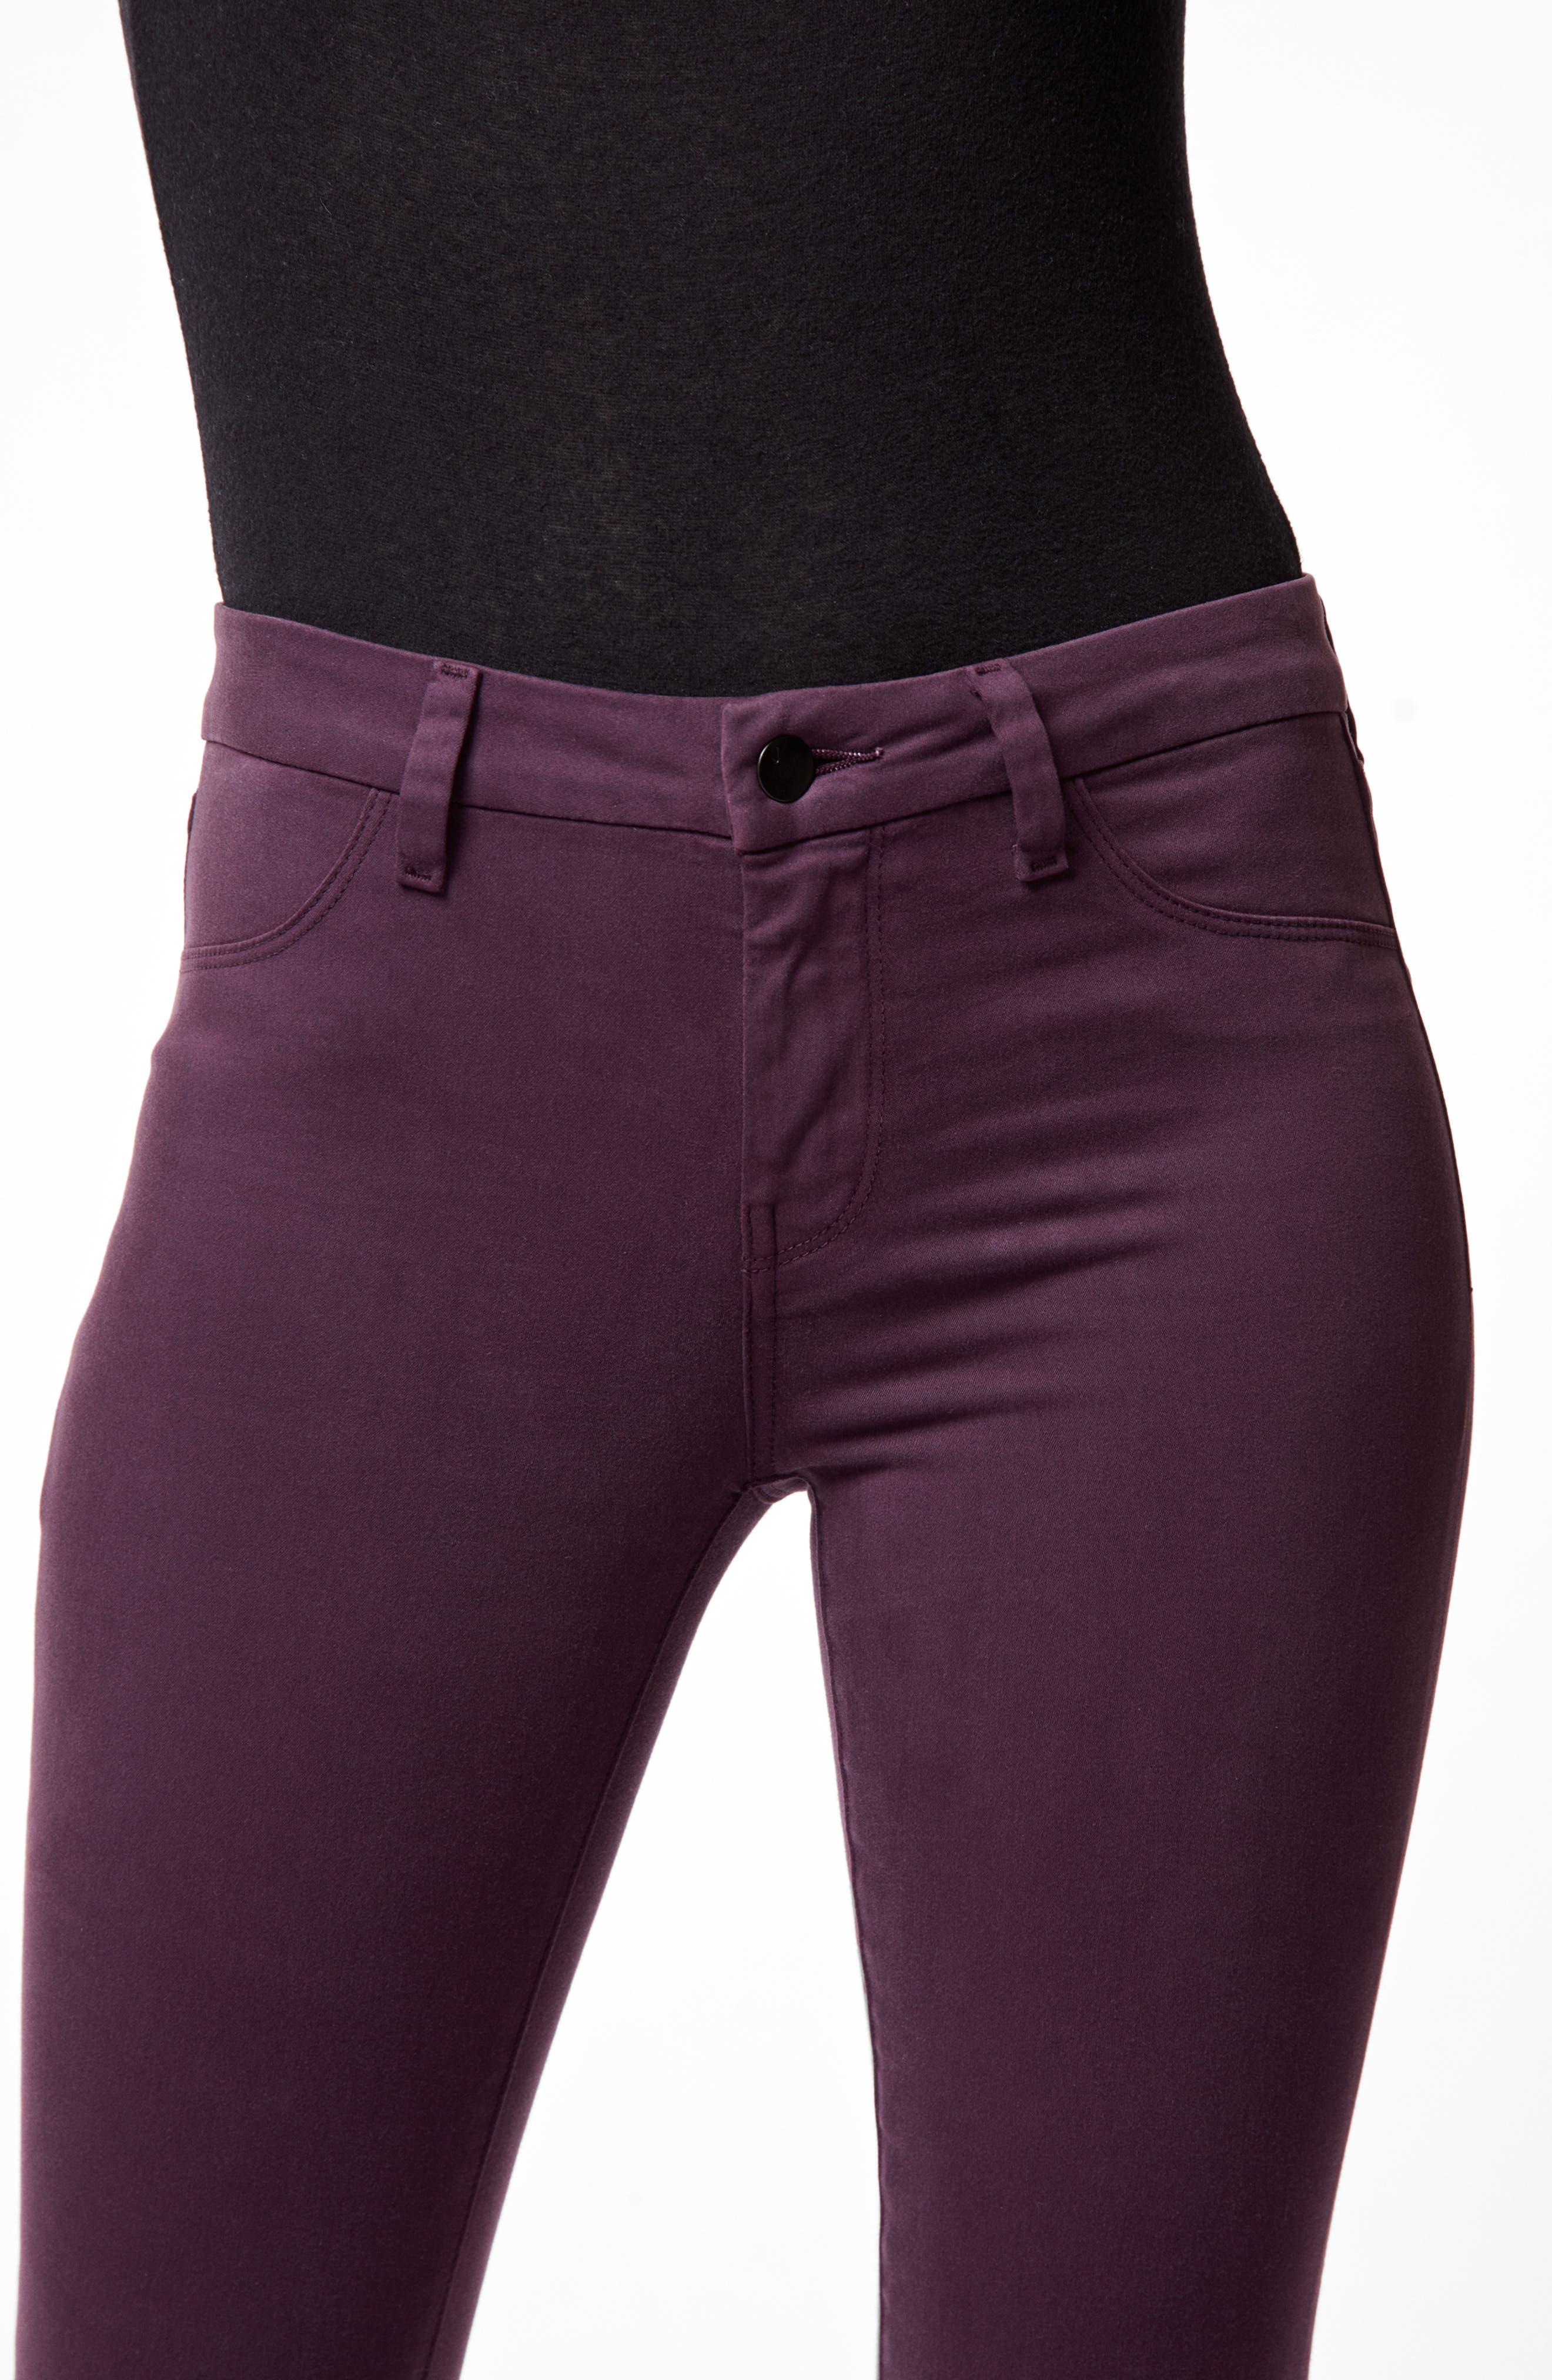 Anja Cuff Crop Jeans,                             Alternate thumbnail 4, color,                             AUBERGINE